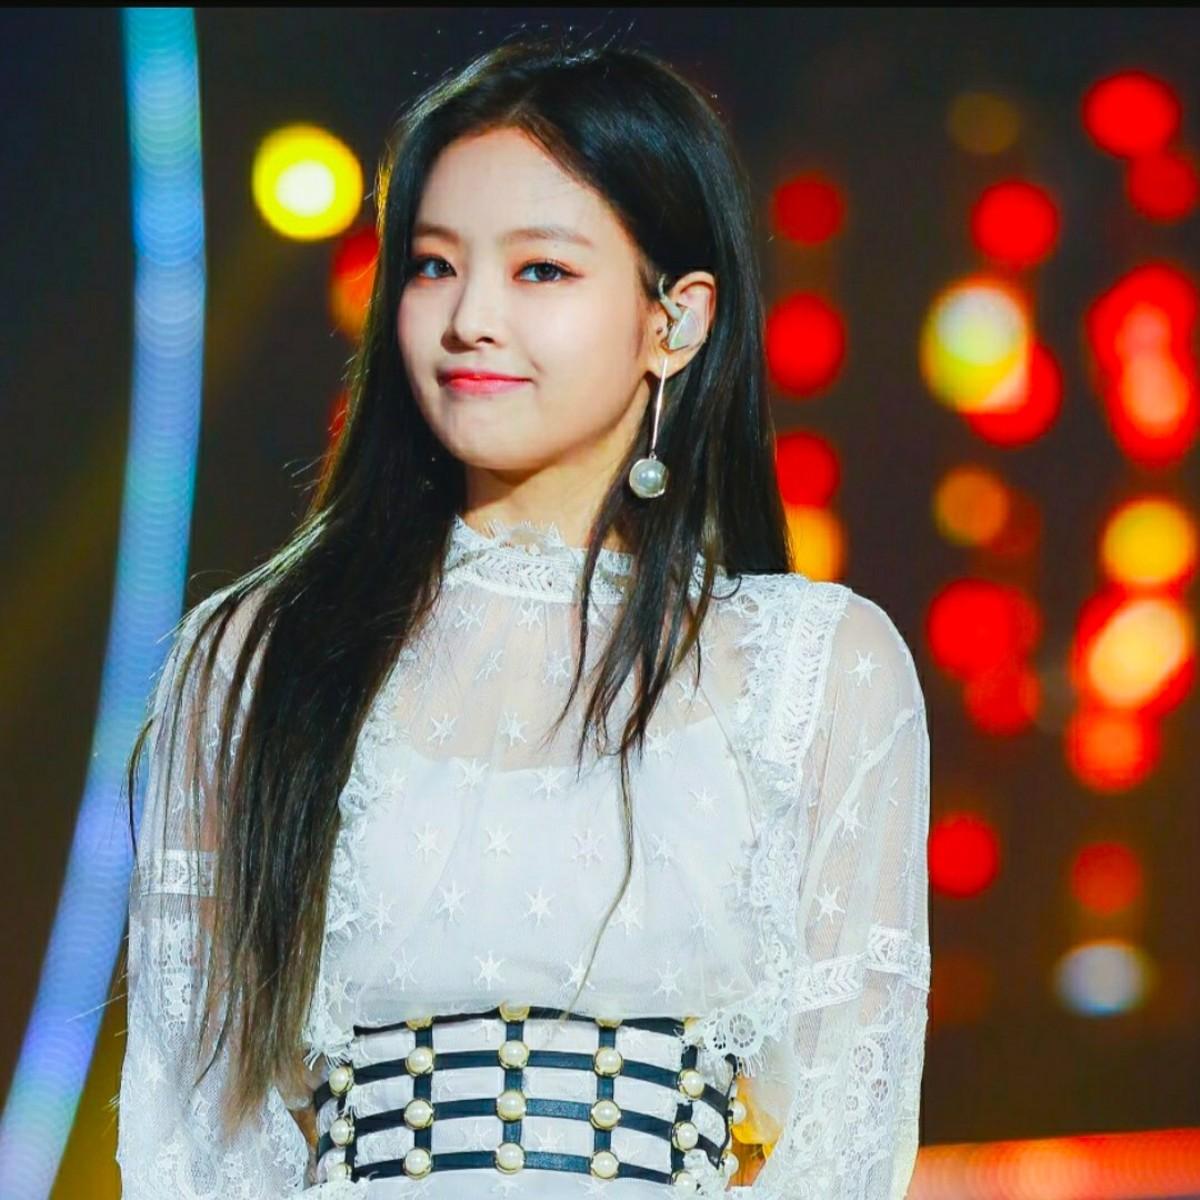 blackpinks-jennie-kim-profile-and-facts